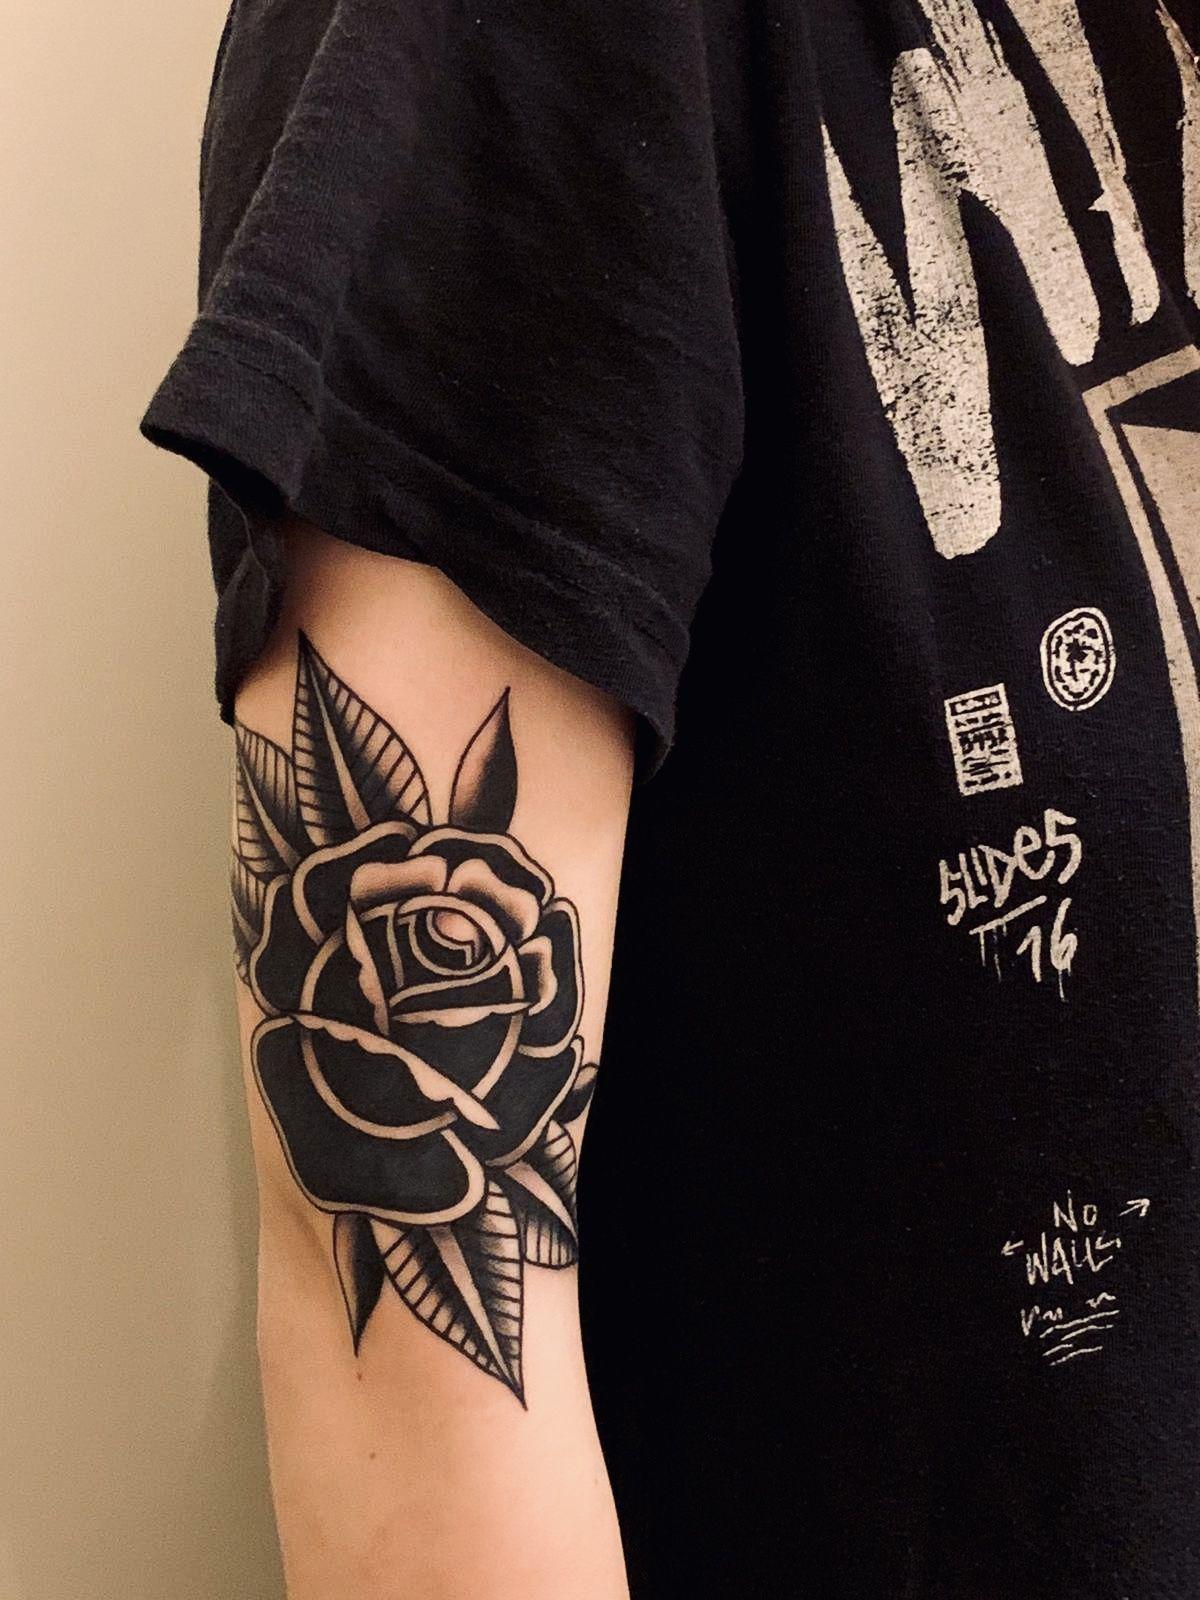 Traditional Rose Tattoo Rose Tattoo Traditional In 2020 Traditional Rose Tattoos Floral Tattoo Sleeve Black Rose Tattoos